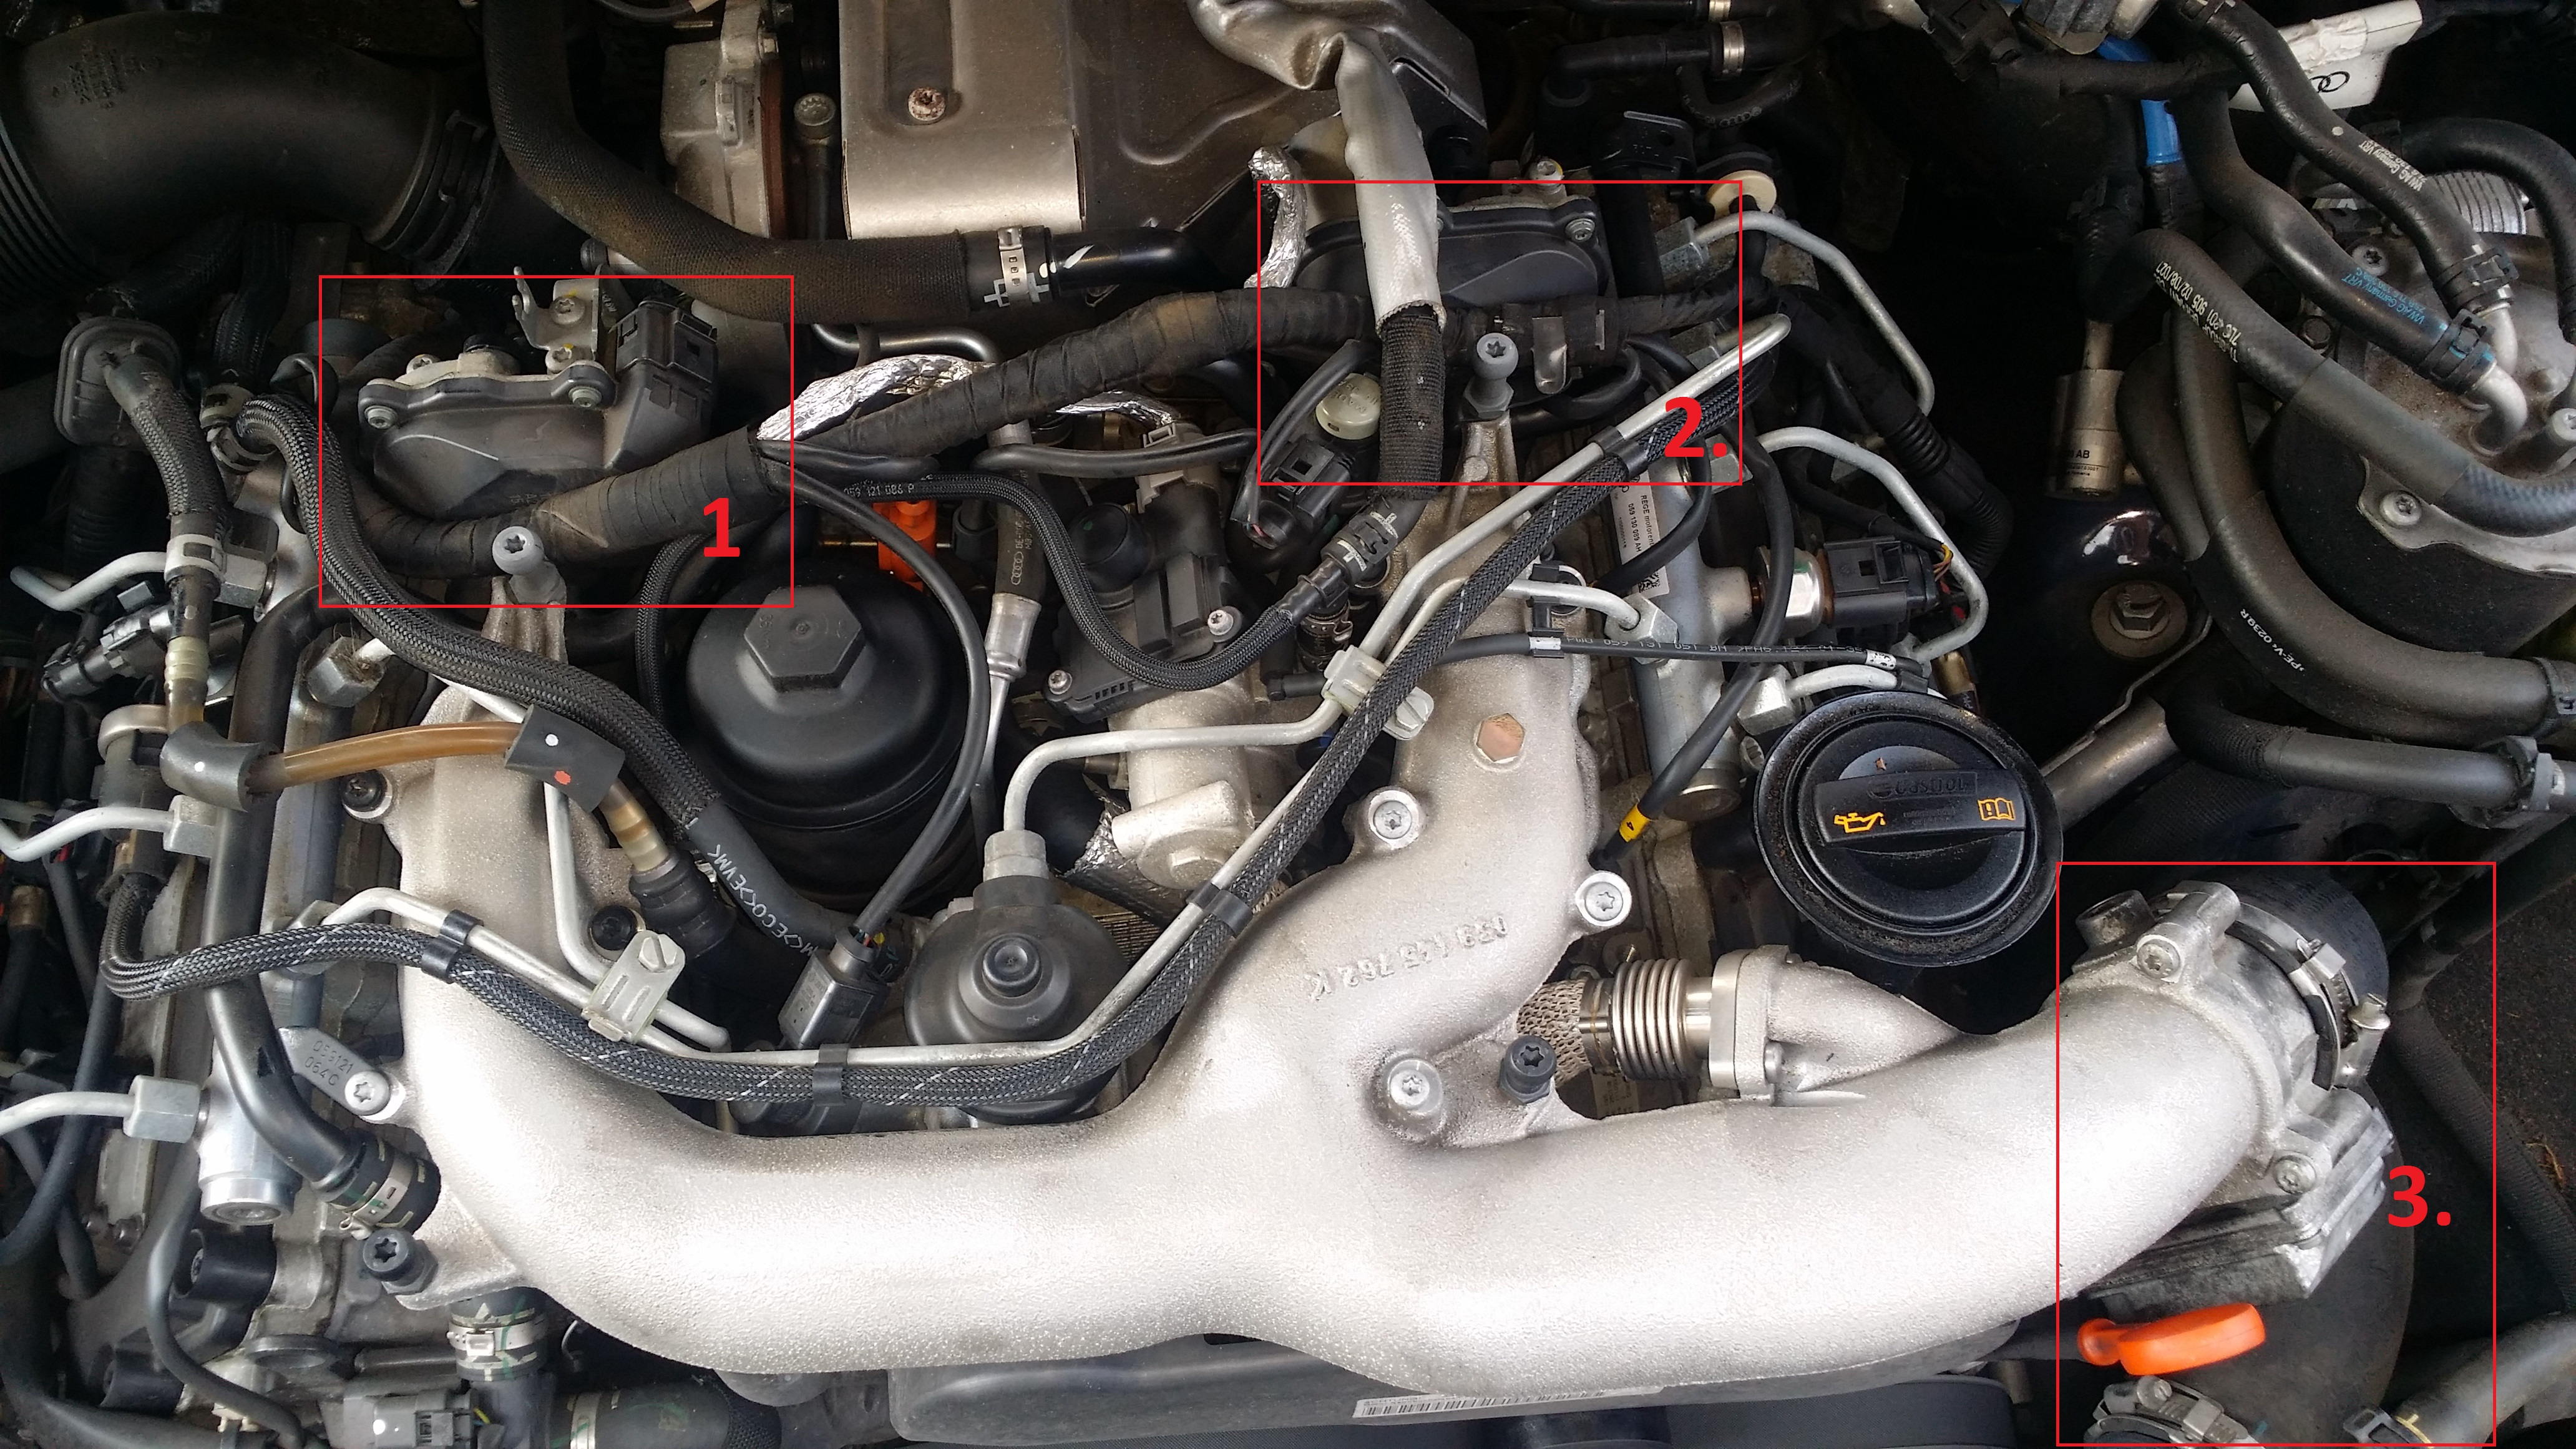 Audi Q7 2008 30tdi Błąd Przepustnicy 001592 P0638